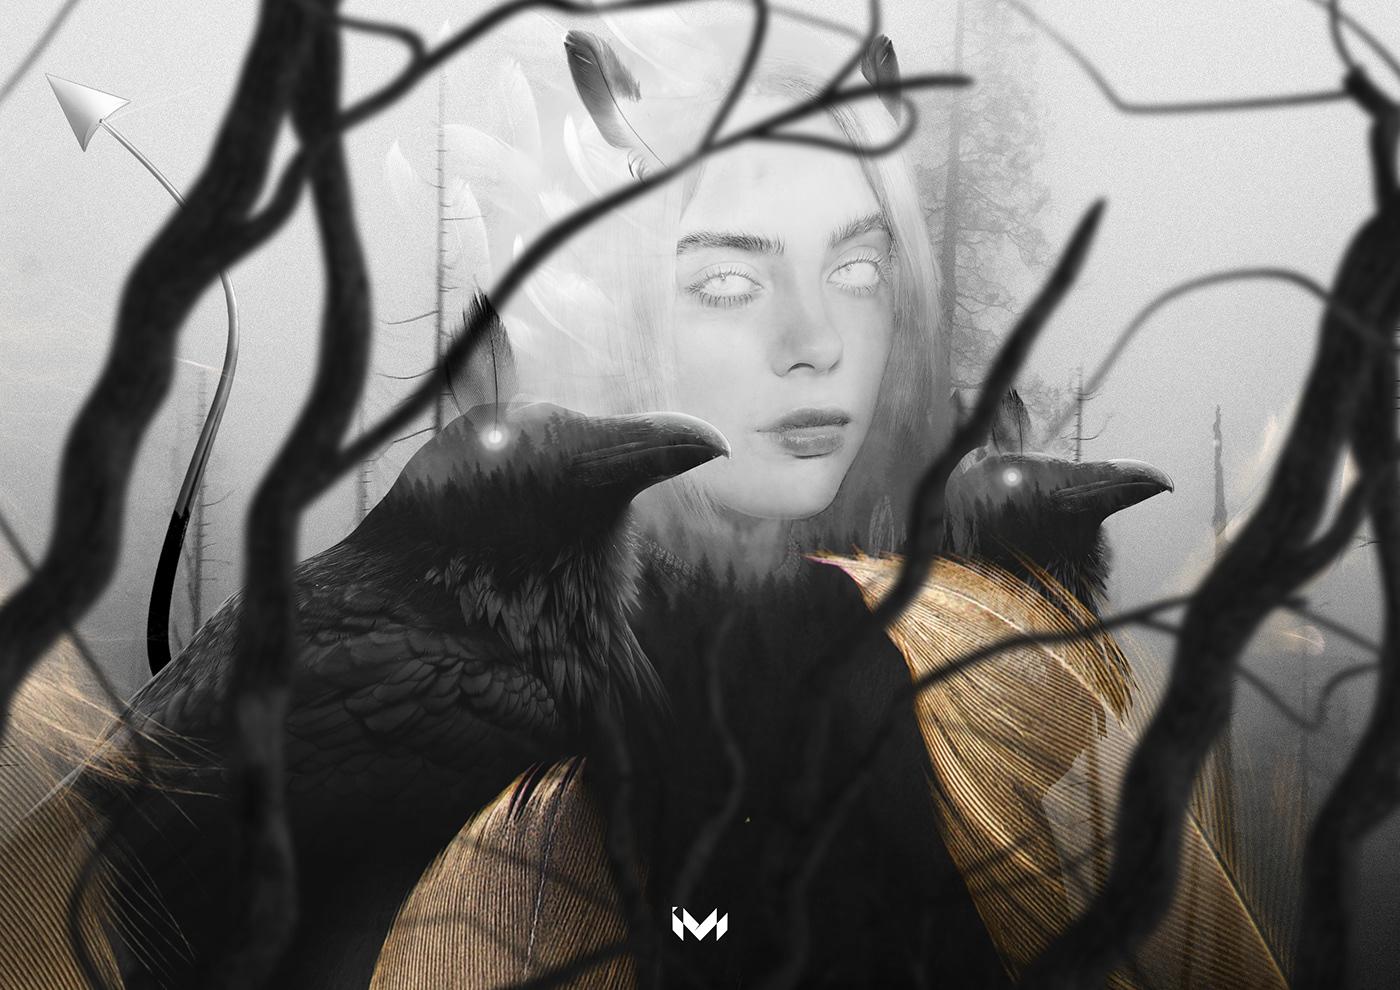 Album art Billie Eilish black cover design graphic photoshop poster White